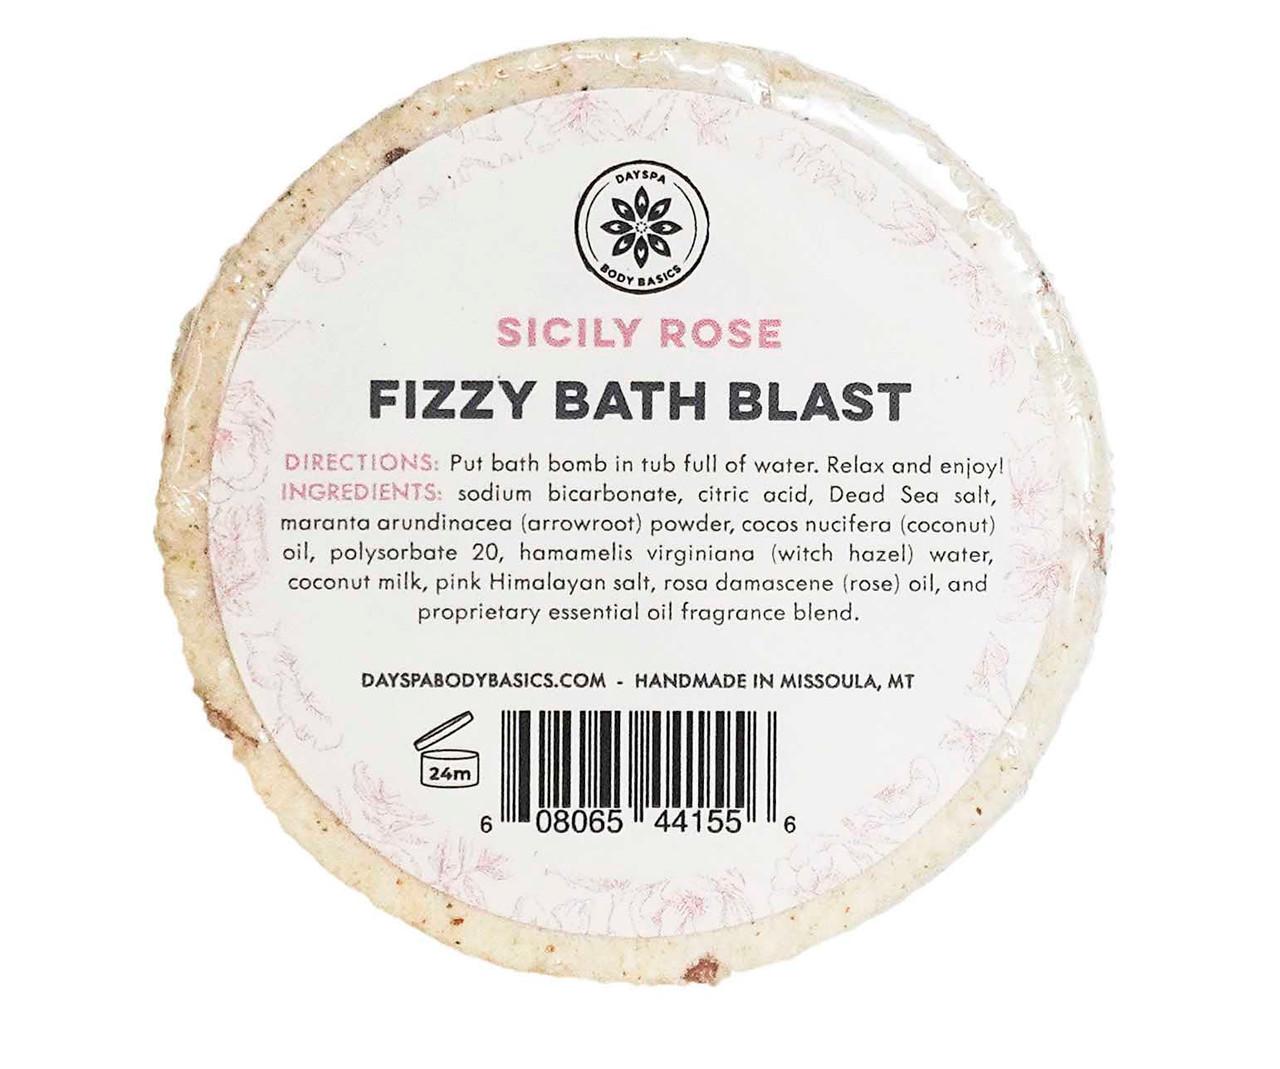 Sicily Rose Bath Blast Bath Bomb